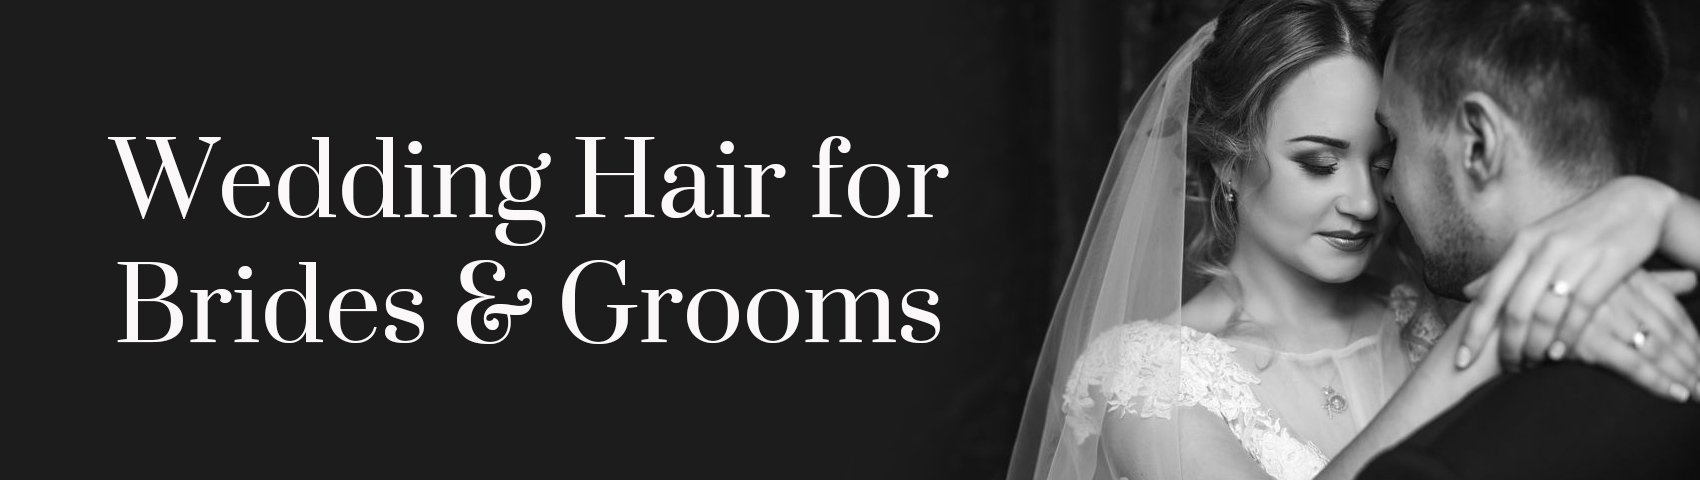 Wedding Hair for Brides Grooms BANNER